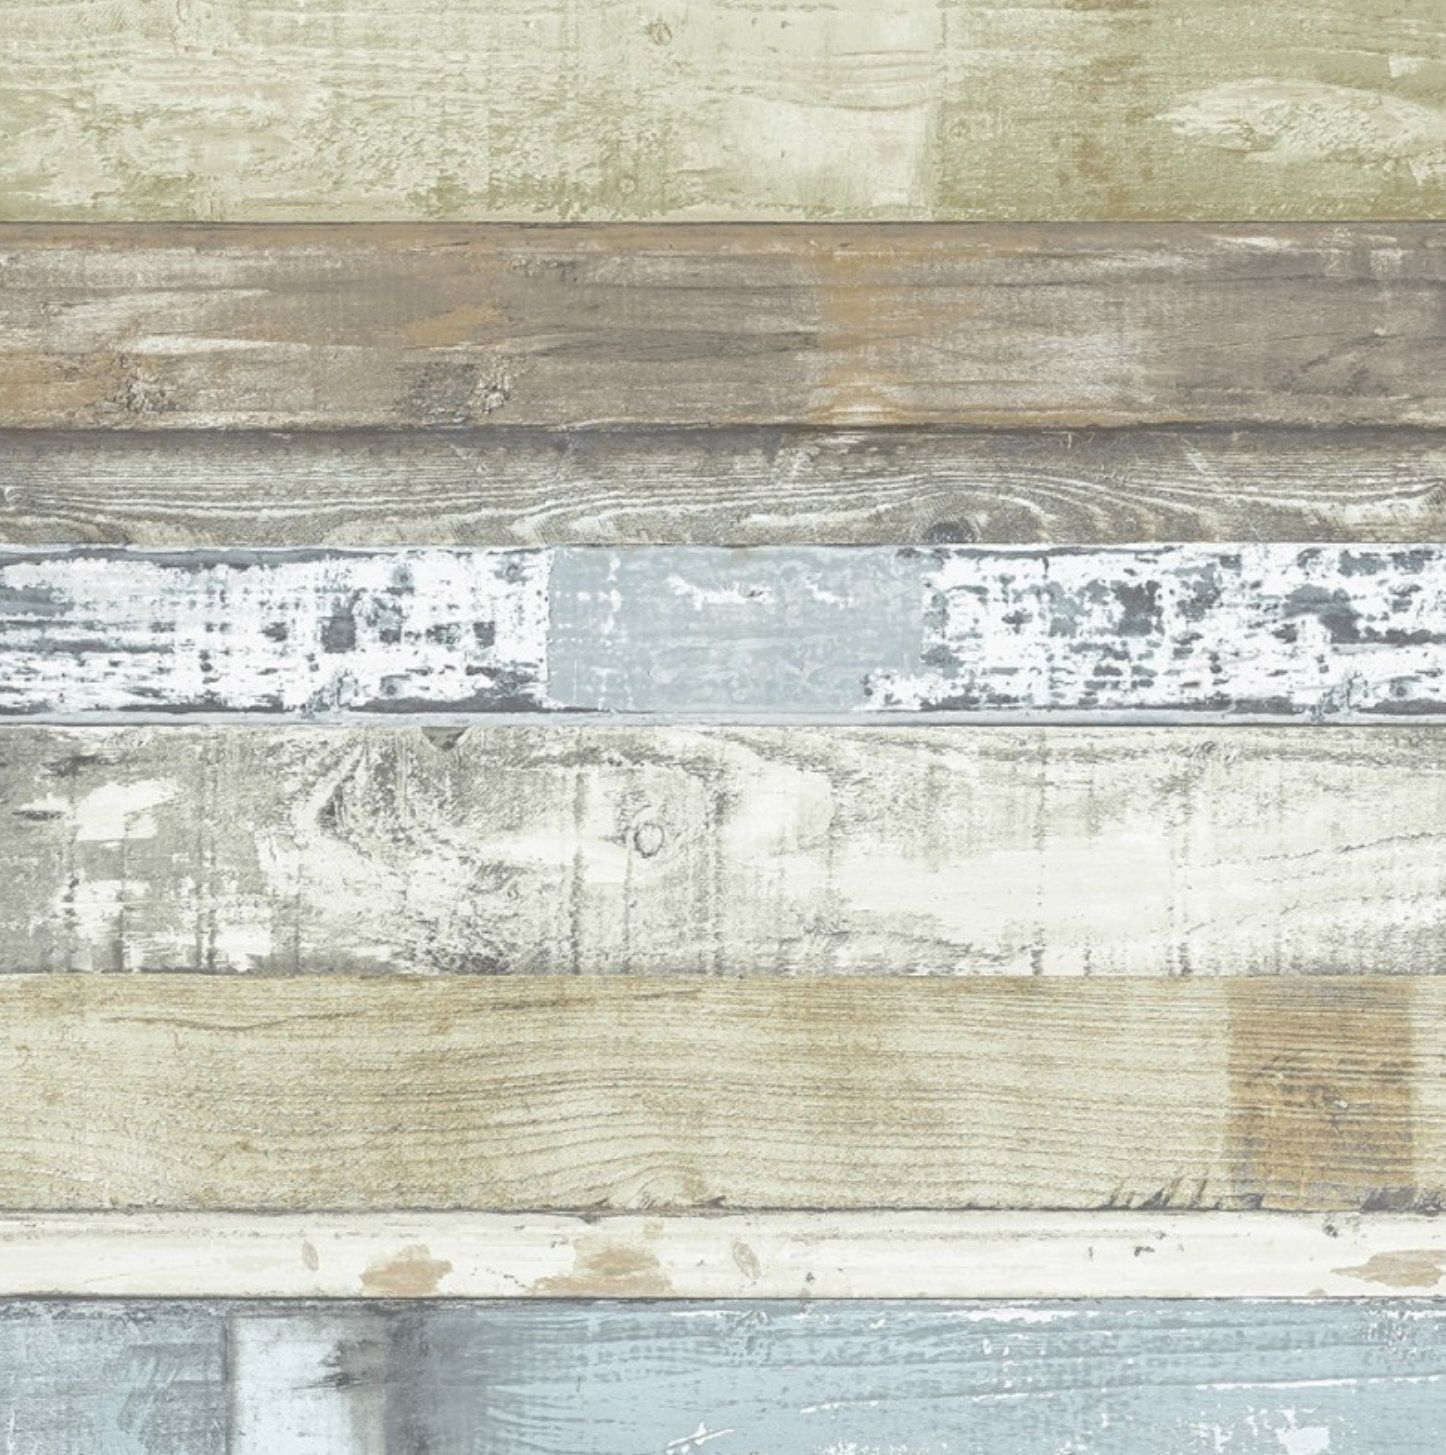 Weathered Coastal Scrap Wood Wallpaper Beach House Blue Distressed Shiplap Boards Rustic Country Farmho Wood Wallpaper Farmhouse Wallpaper Wallpaper Panels